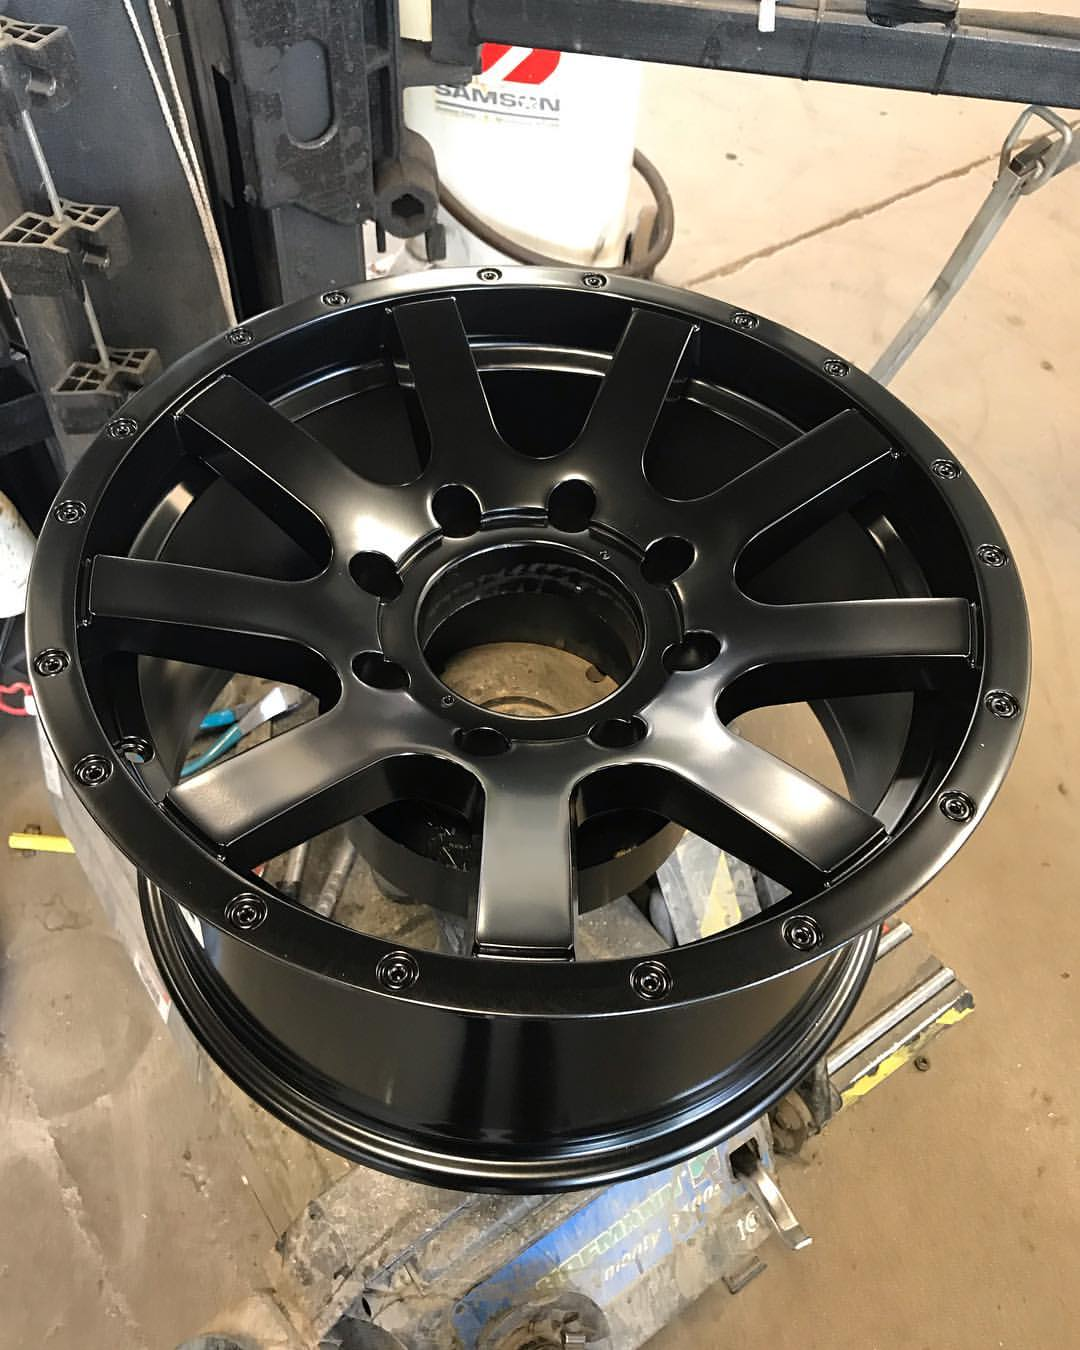 2016 Chevrolet 3500 Rims - Good 2 Go Tirecraft Auto Centre